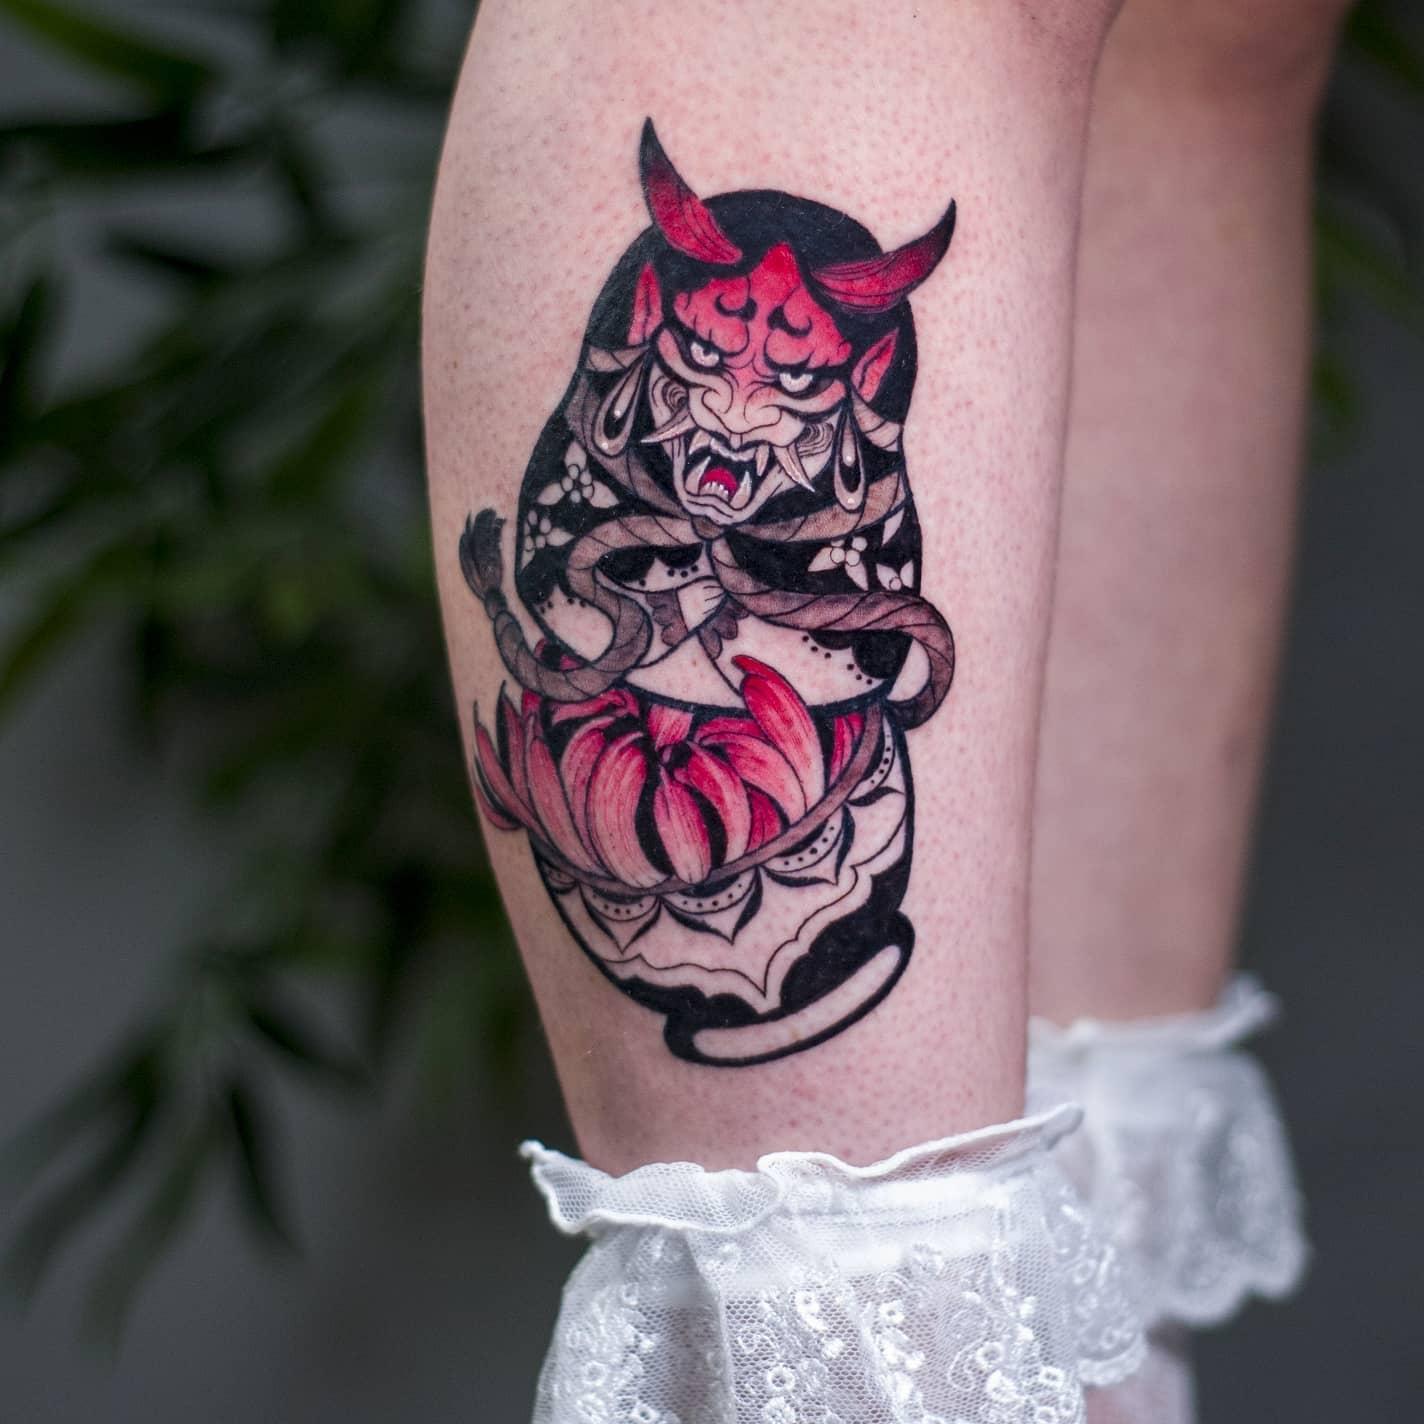 colorful matryoshka HANNYA MASK tattoo קעקוע צבעוני מטריושקה ומסכת הניה קישוט לרגל עיצוב מקורי התאמה אישית